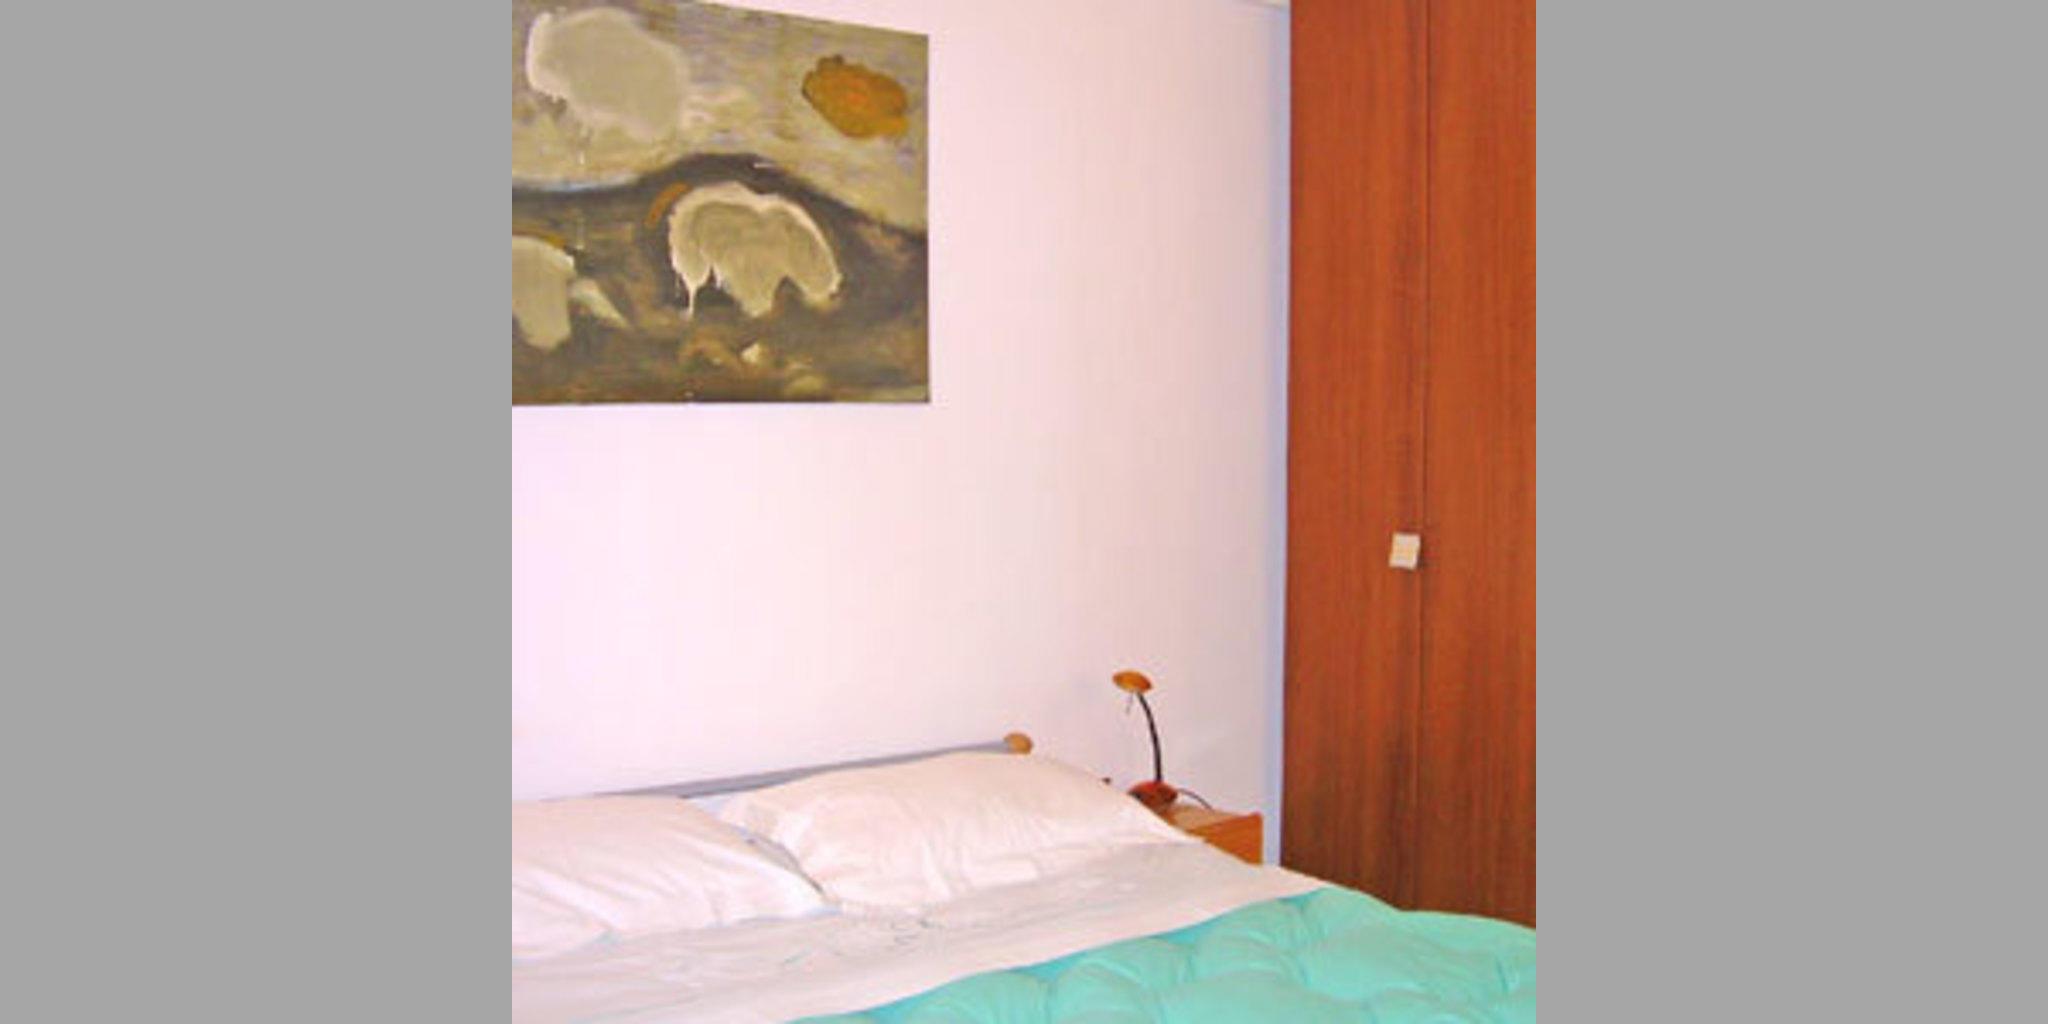 Bed breakfast san vincenzo for Le canape molfetta